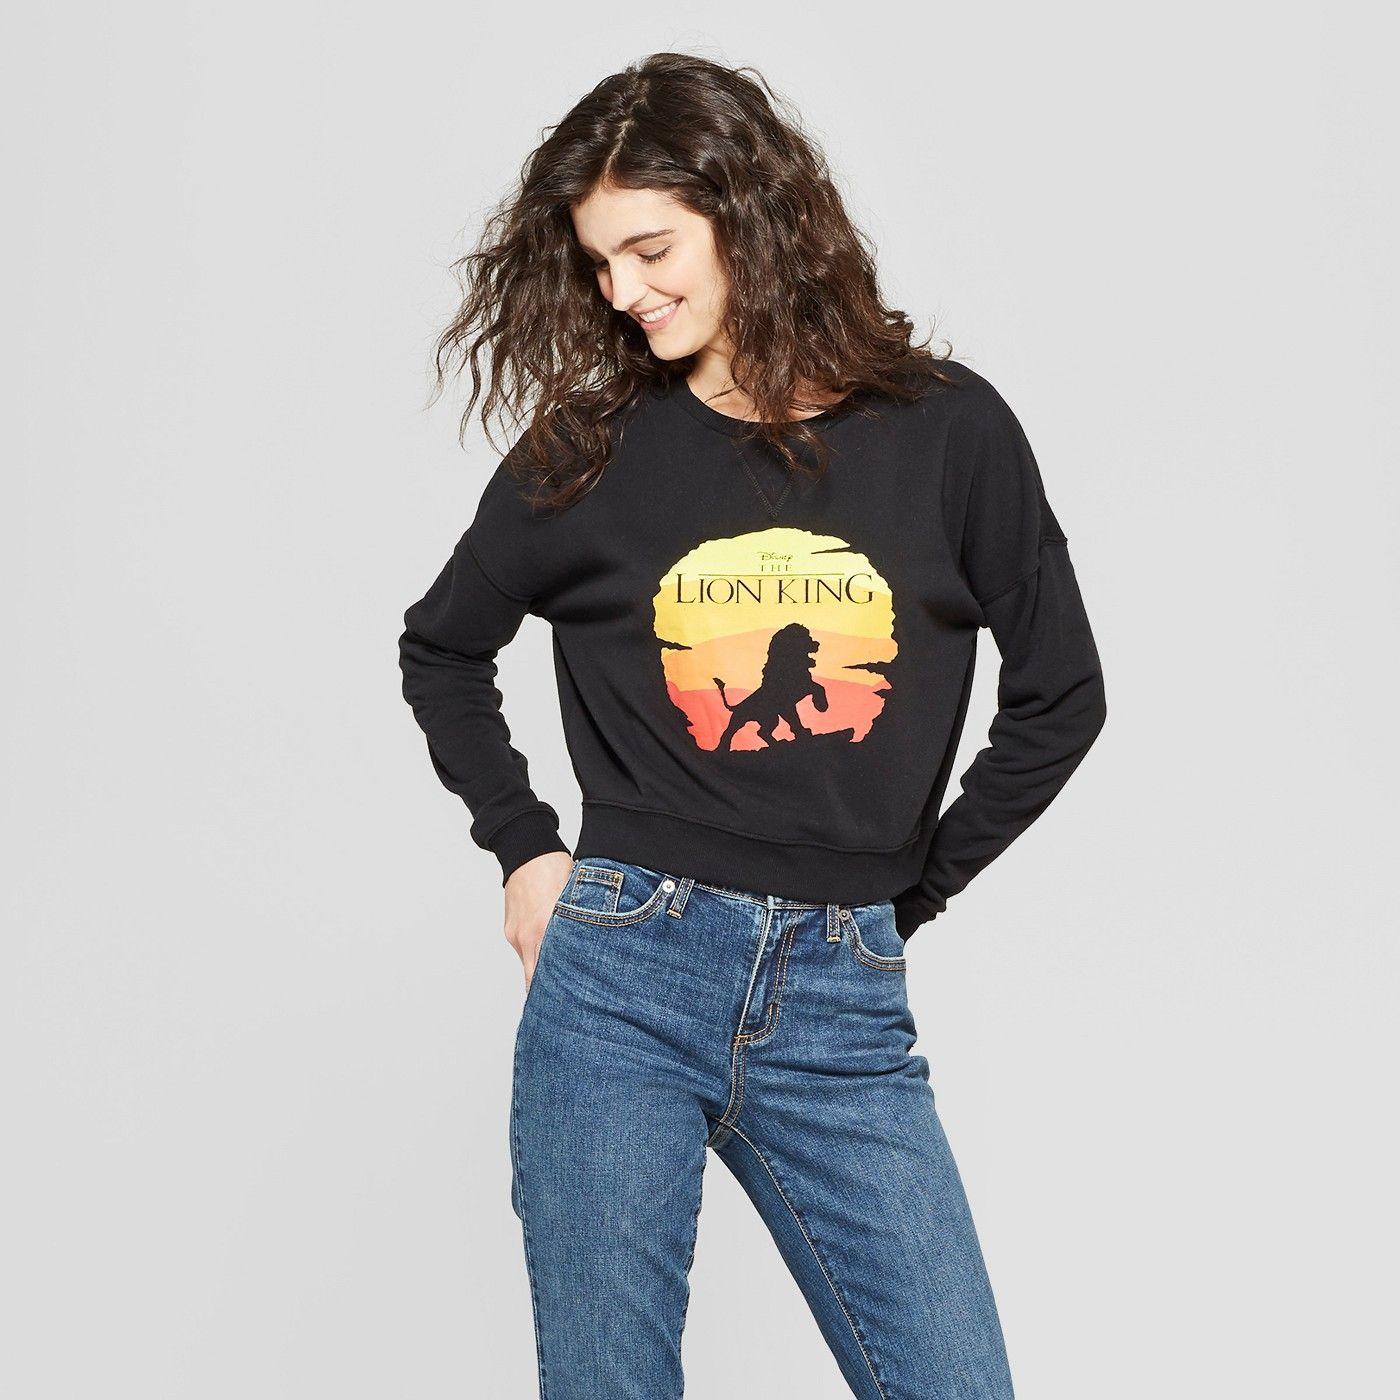 Women S Disney The Lion King Graphic Sweatshirt Affiliate Thelionking Tshirt Target Targetstyle Black Cropped Sweater Graphic Sweatshirt Sweatshirts [ 1400 x 1400 Pixel ]